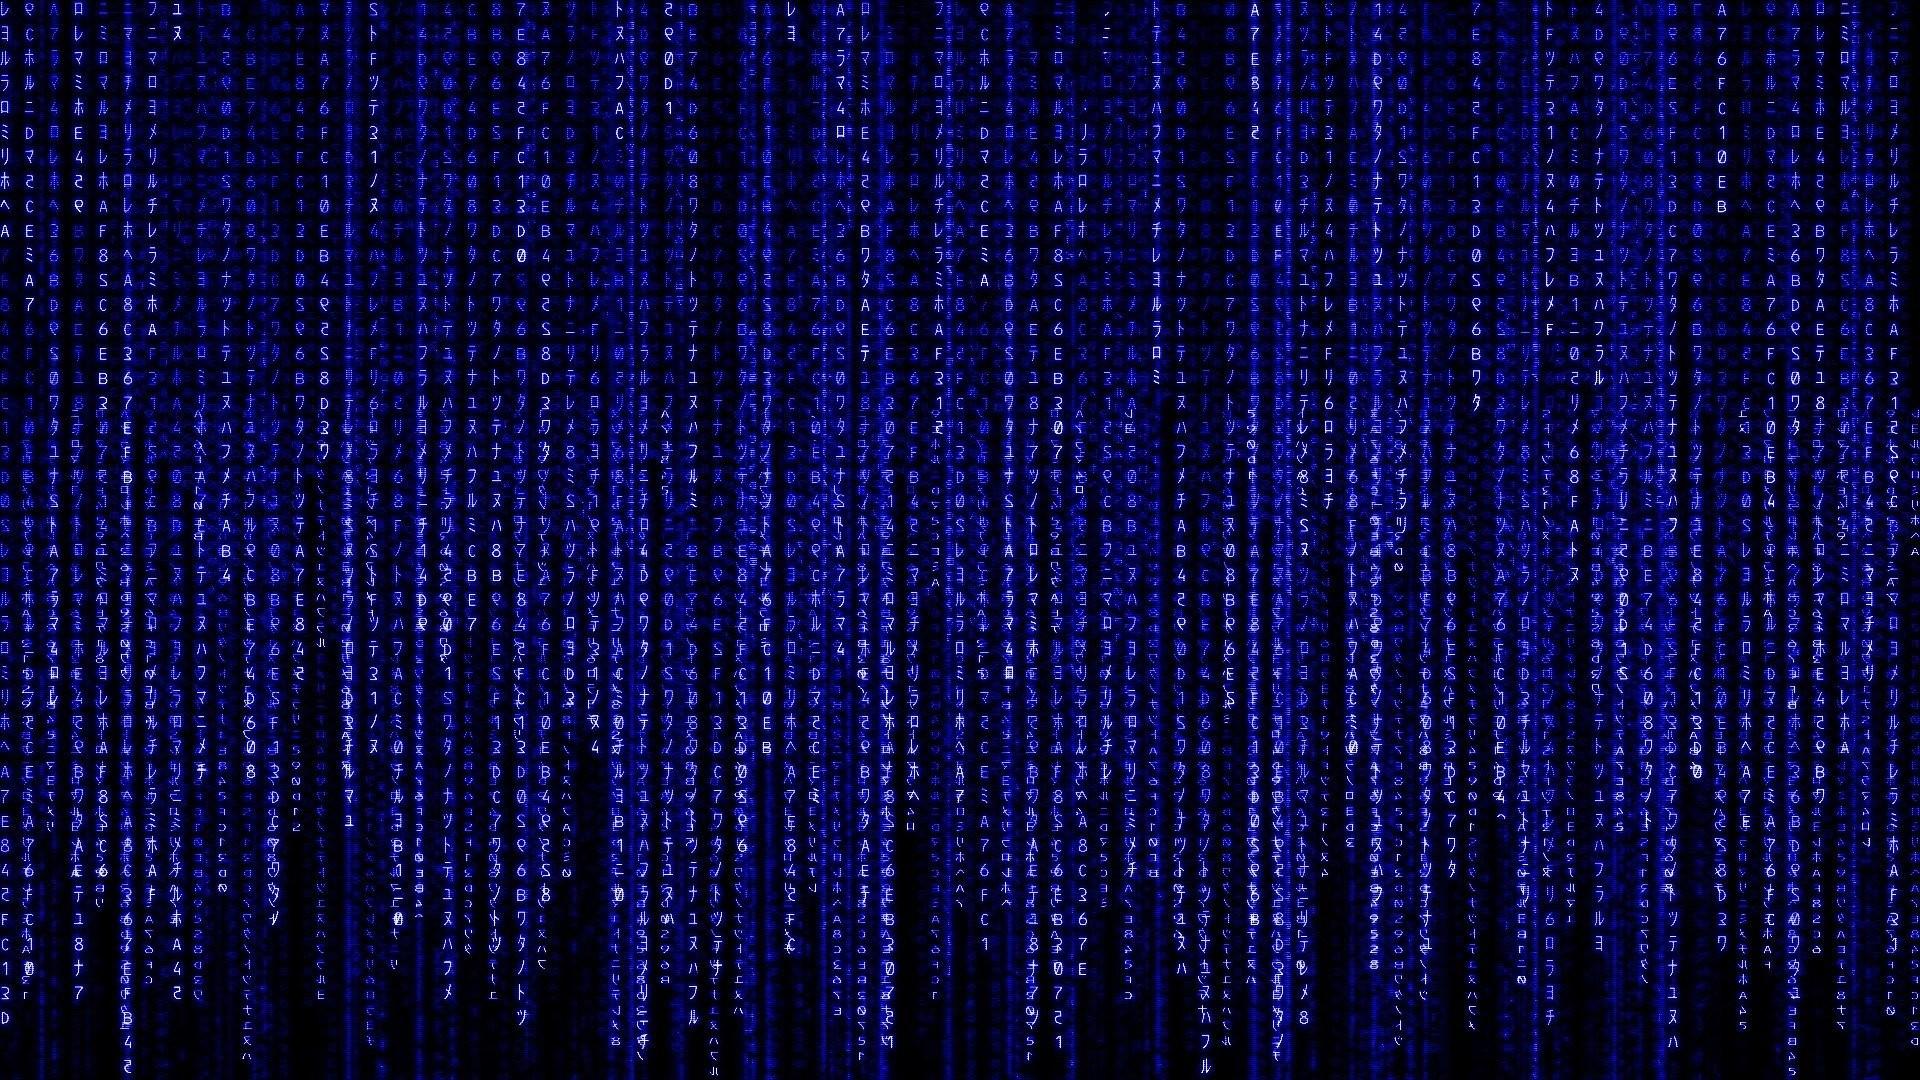 space matrix for dell Answer to please provide the space matrix for dell.